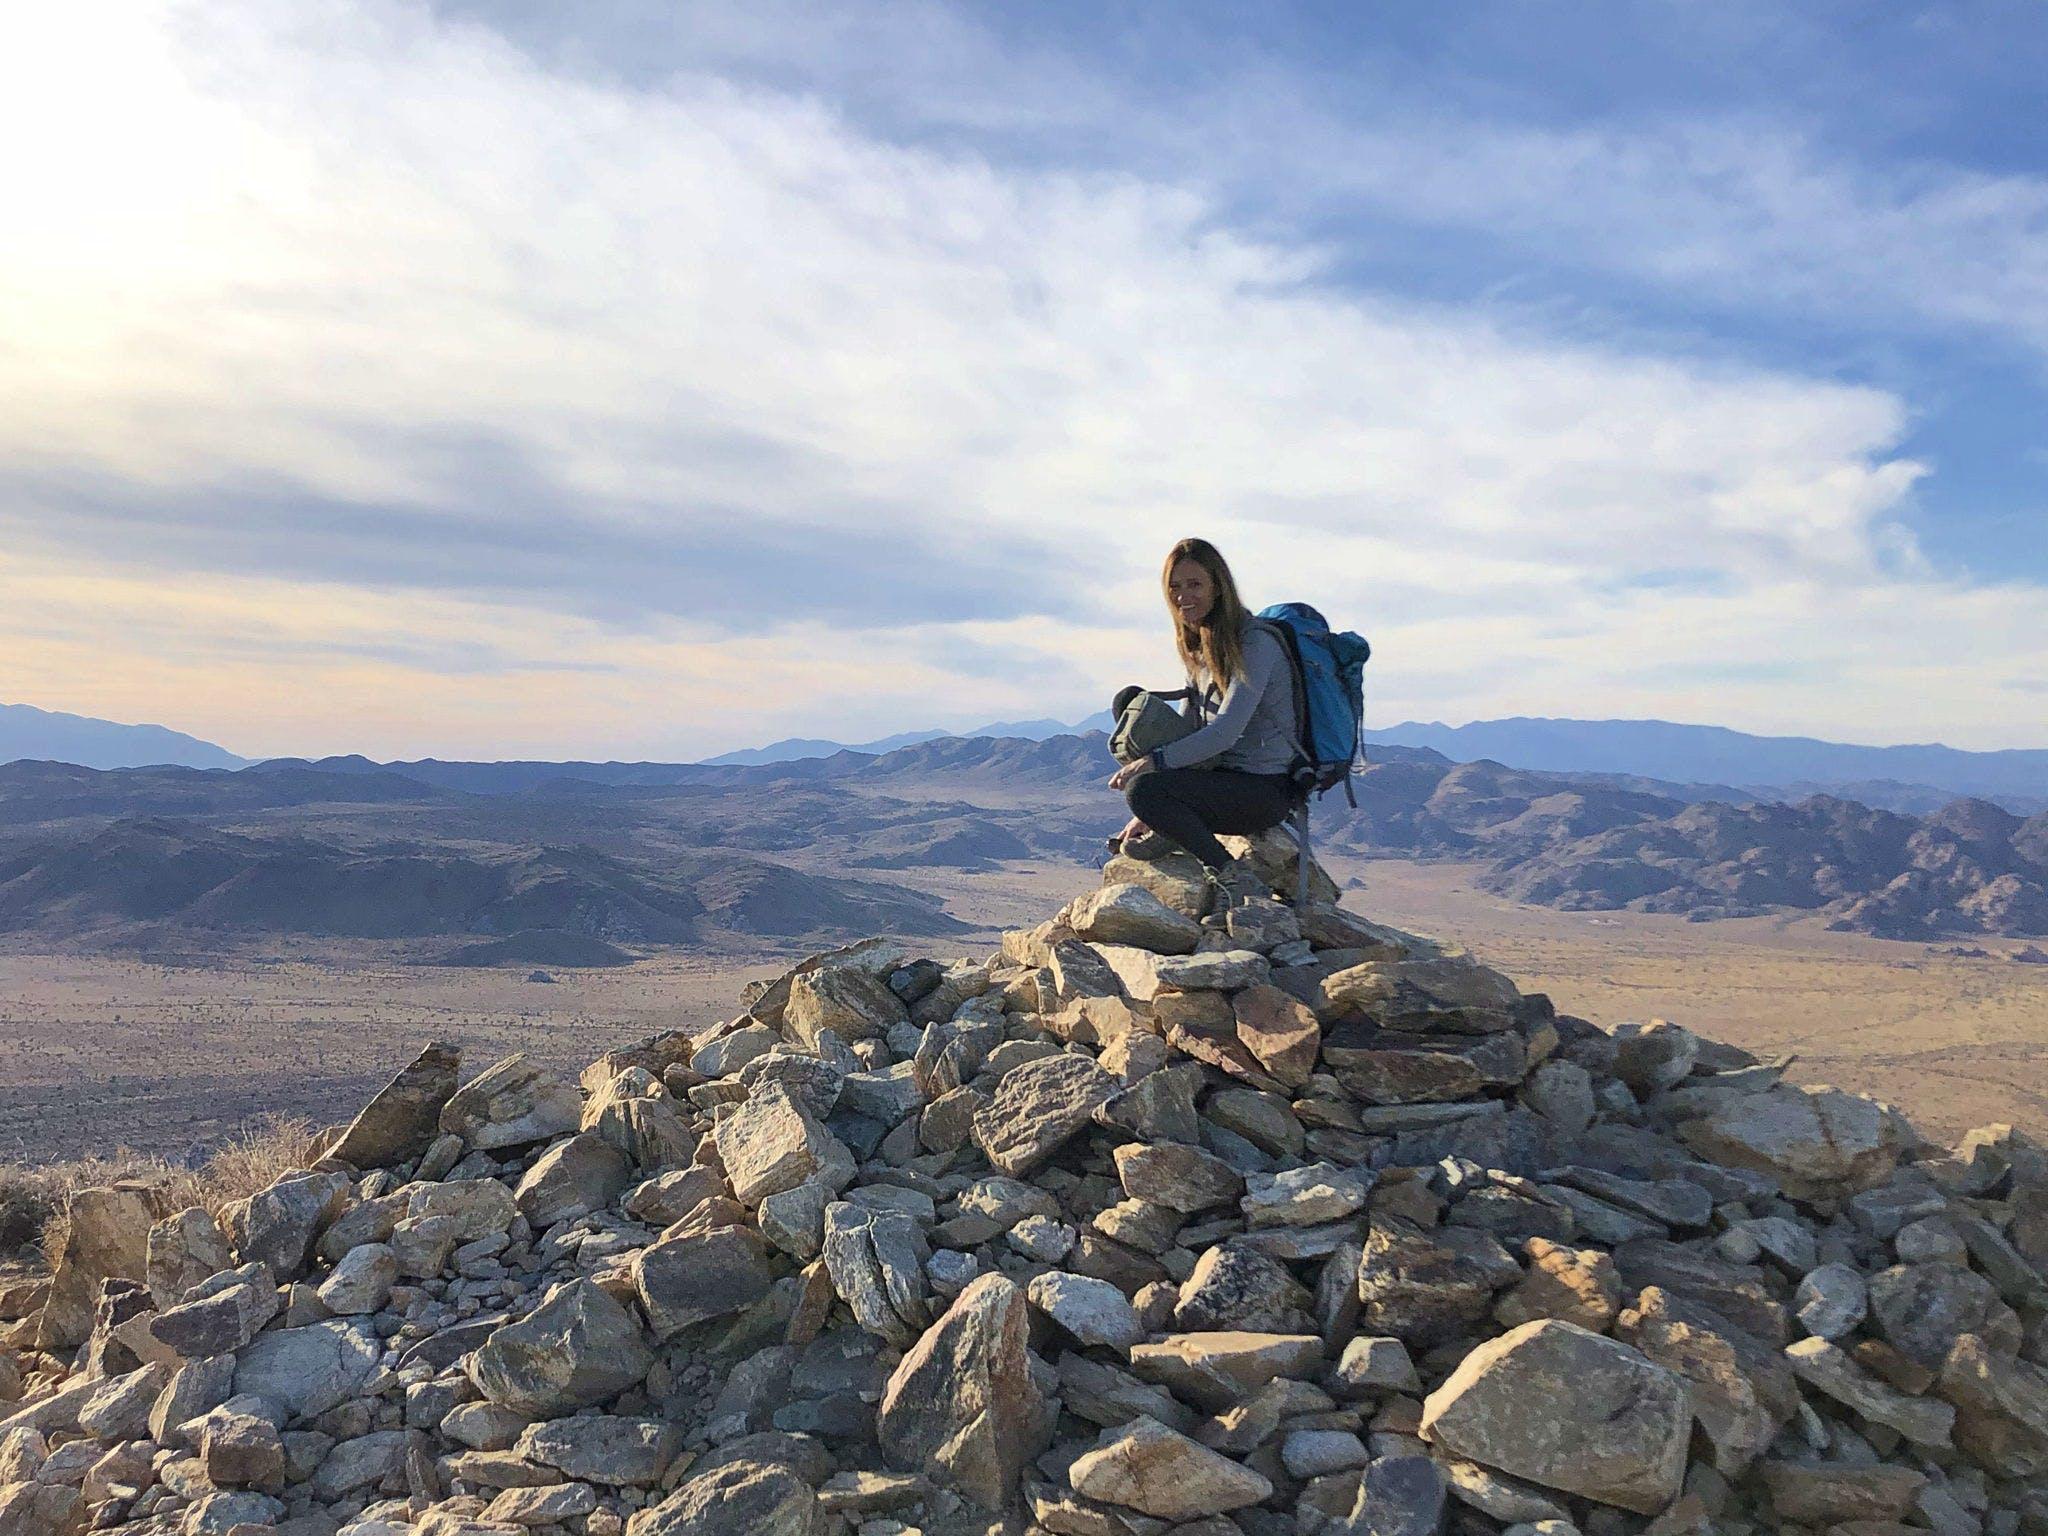 Woman sitting on rock pile at Ryan Peak in Joshua Tree National Park